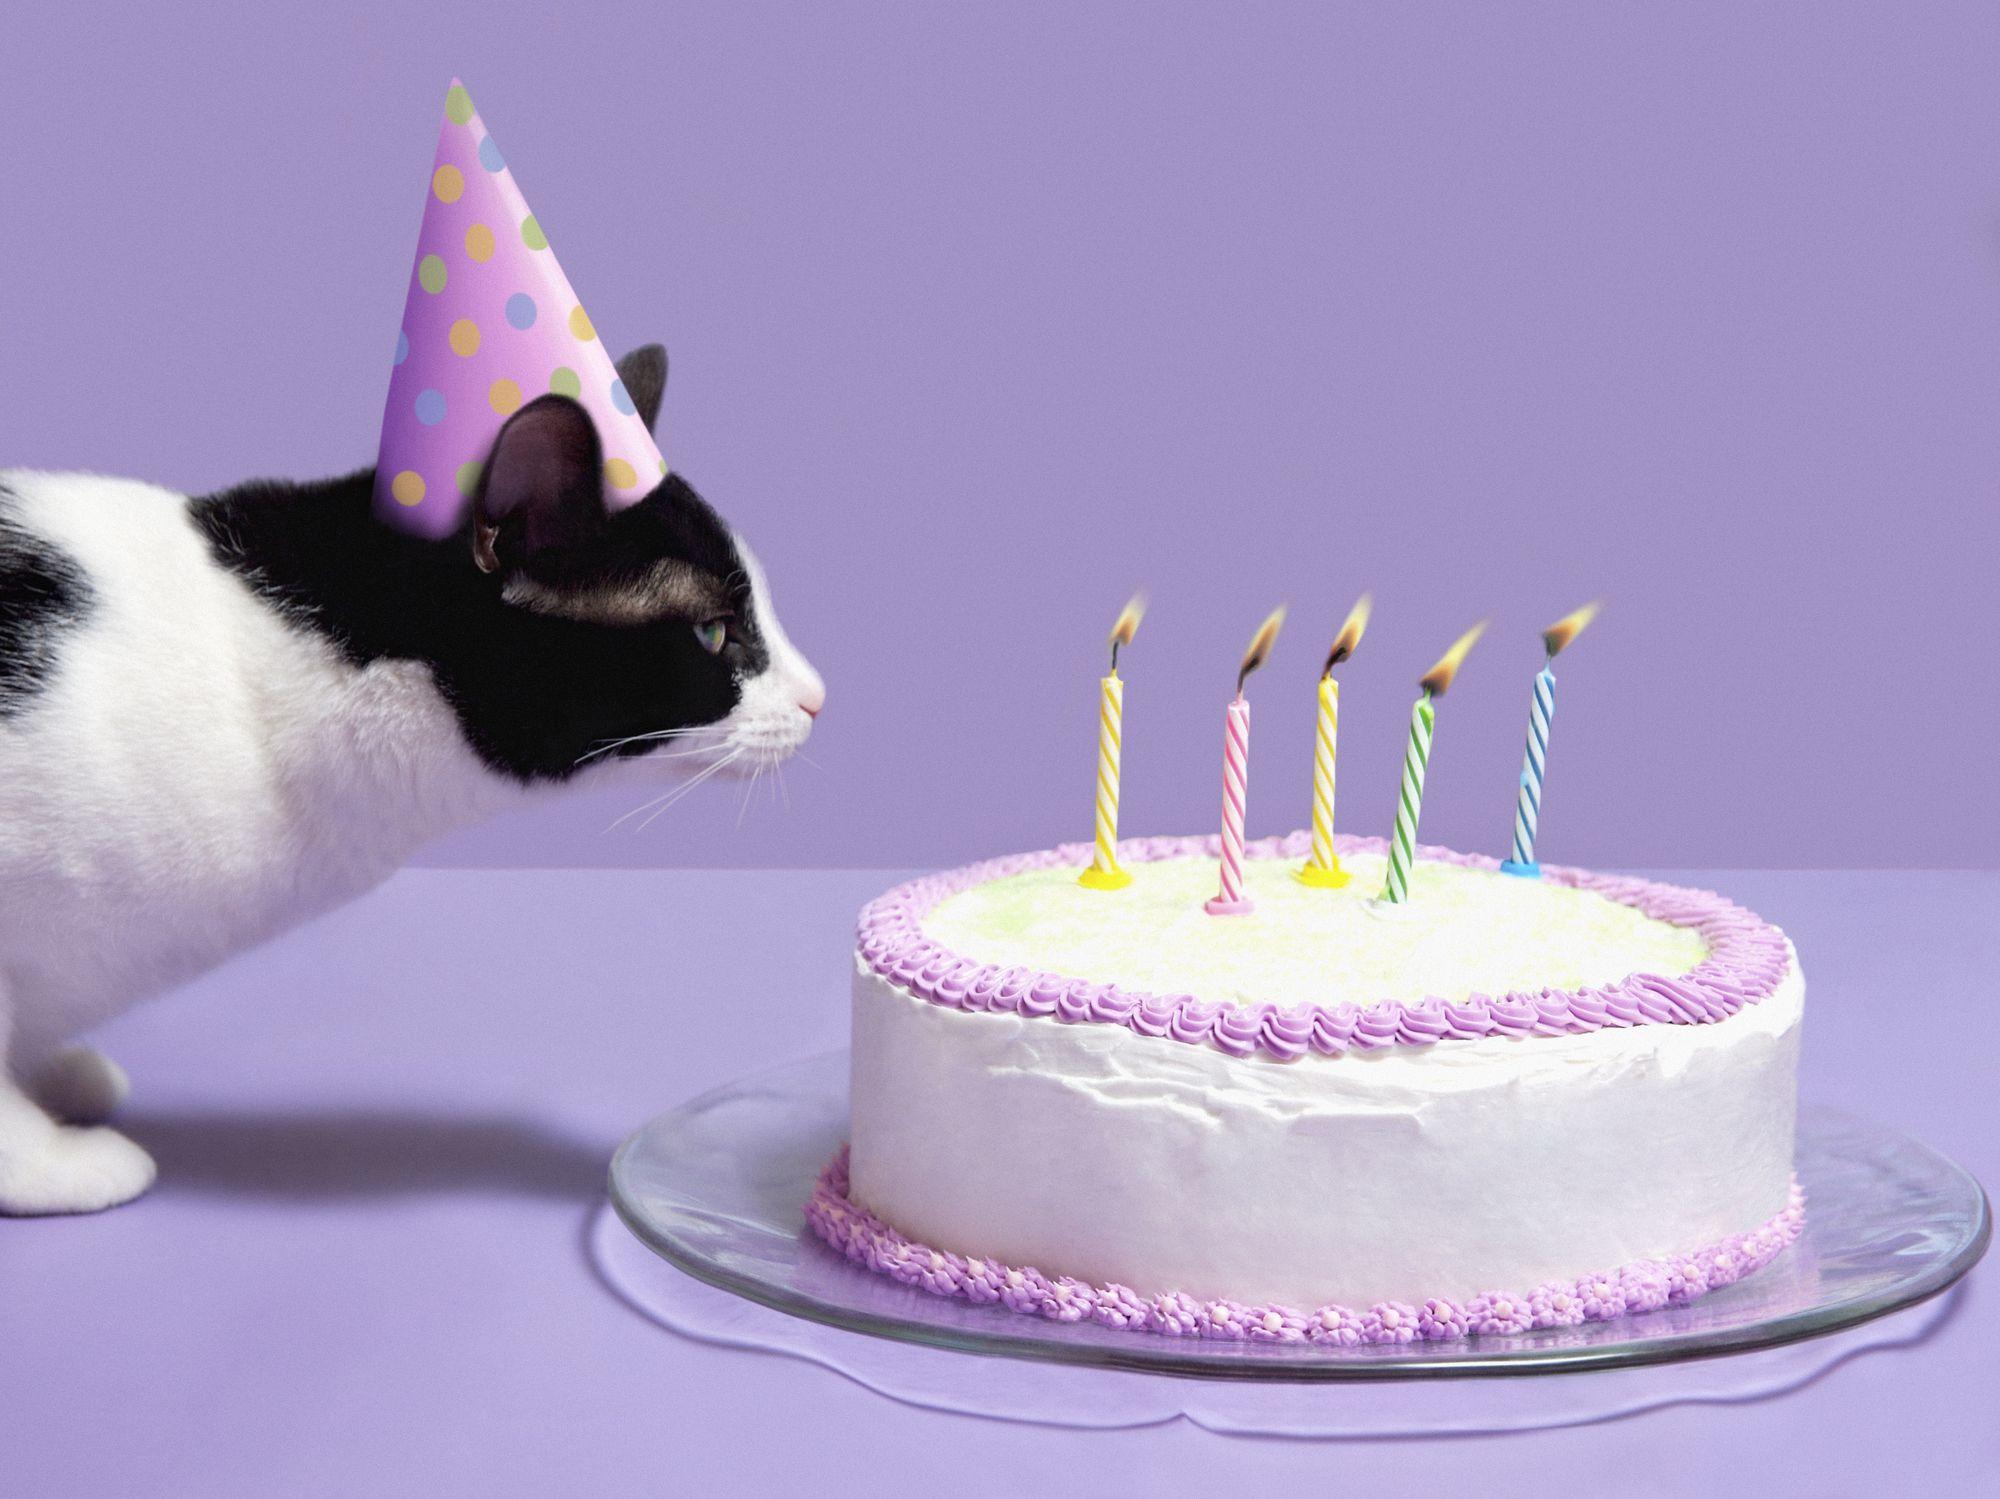 5 Year Old Birthday Cat